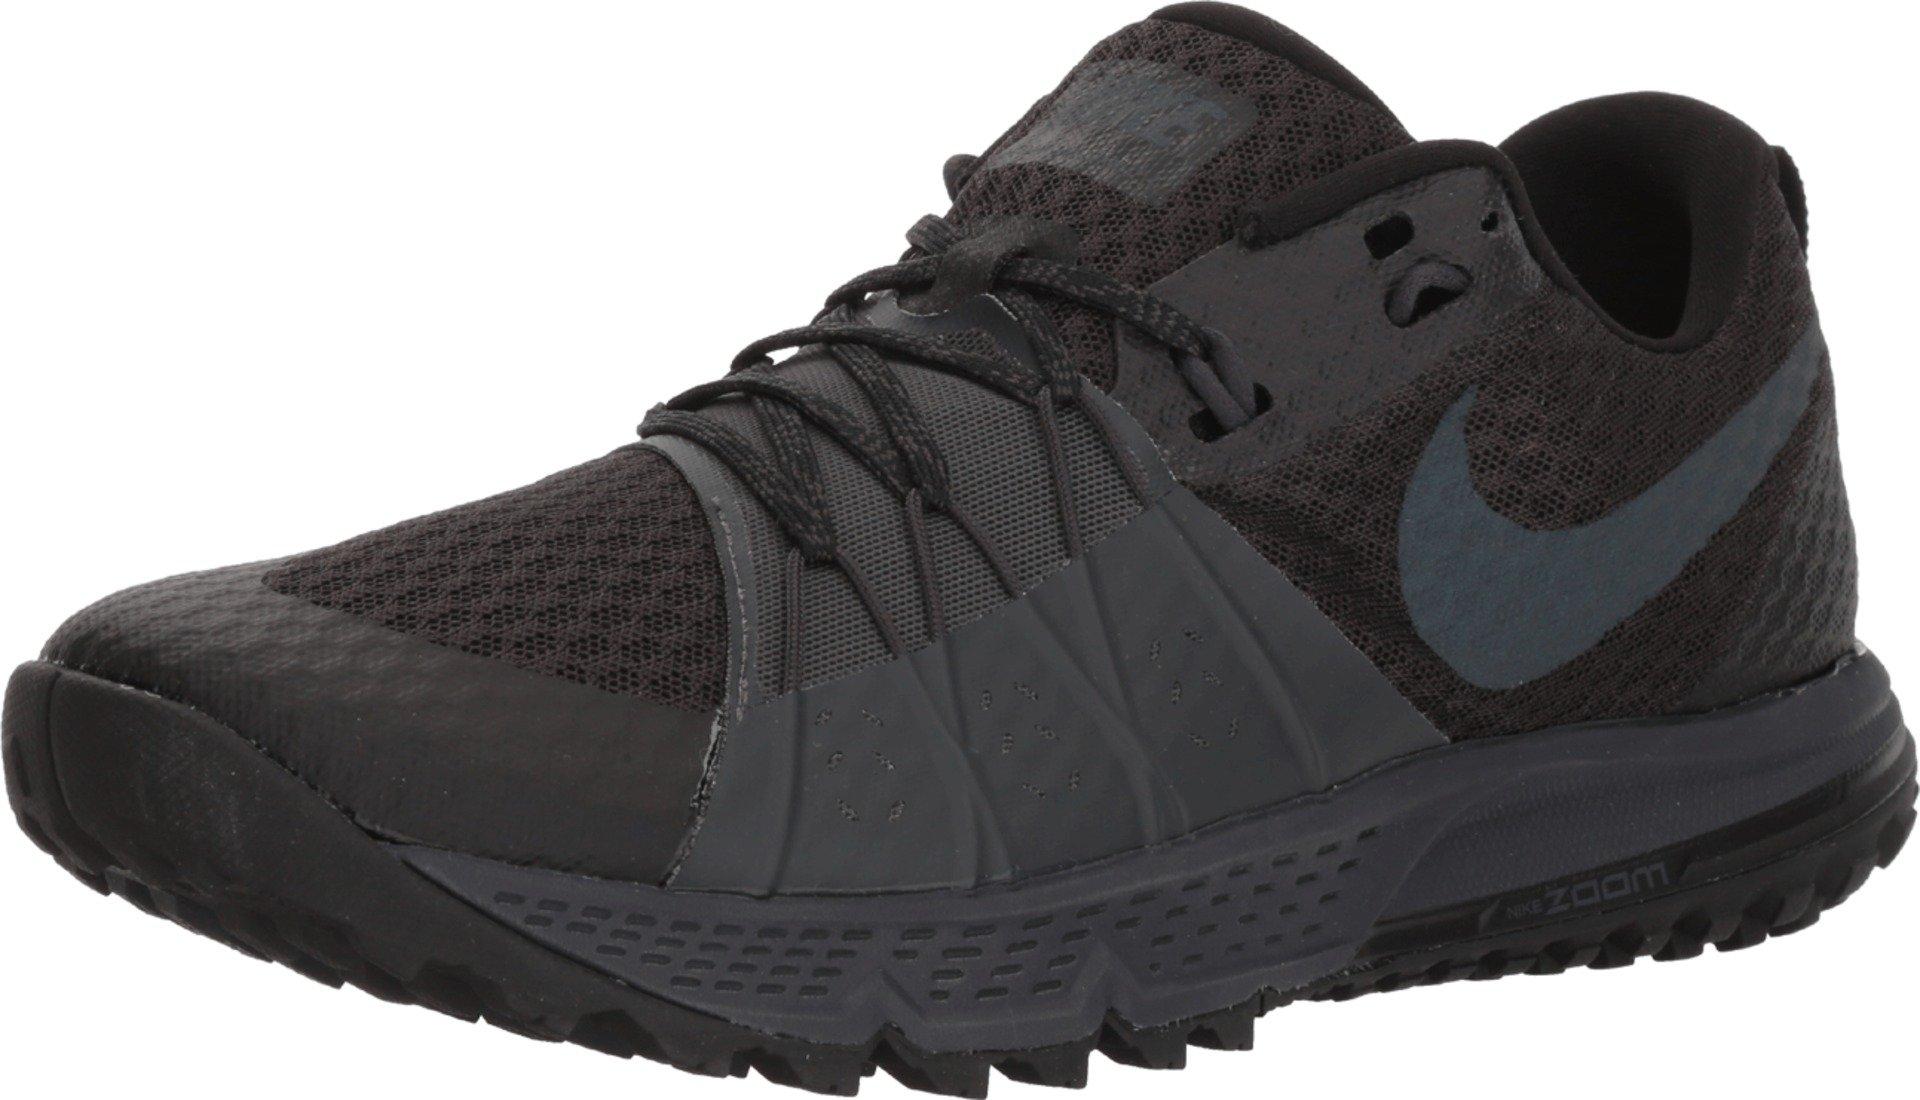 Nike Men's Air Zoom Wildhorse 4 Running Shoe Black/Anthracite-Anthracite 8.5